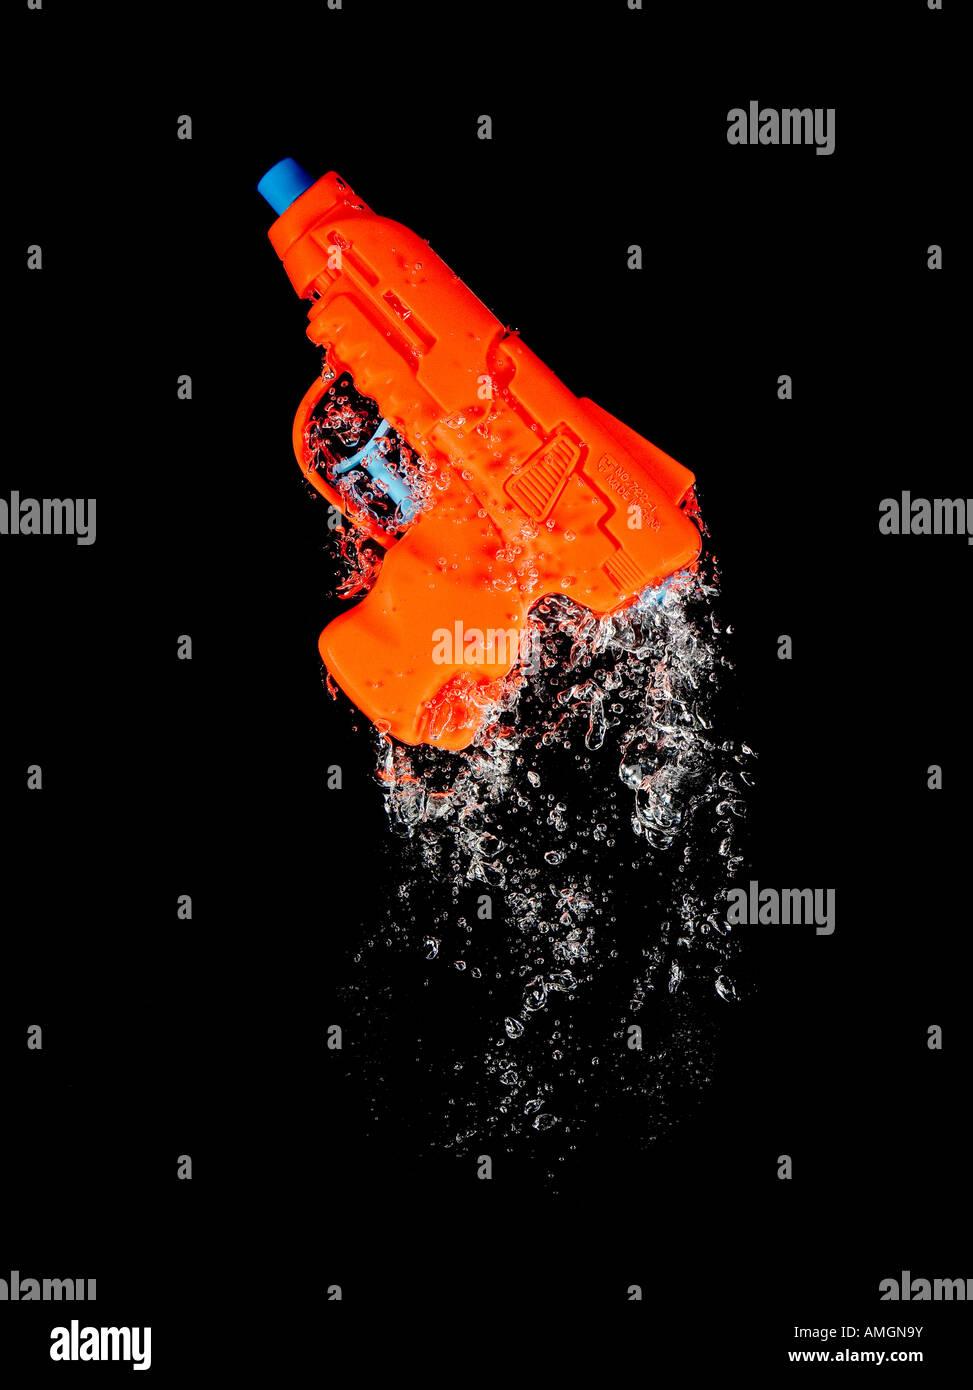 Pistola de agua moviéndose a través del agua con burbujas Imagen De Stock